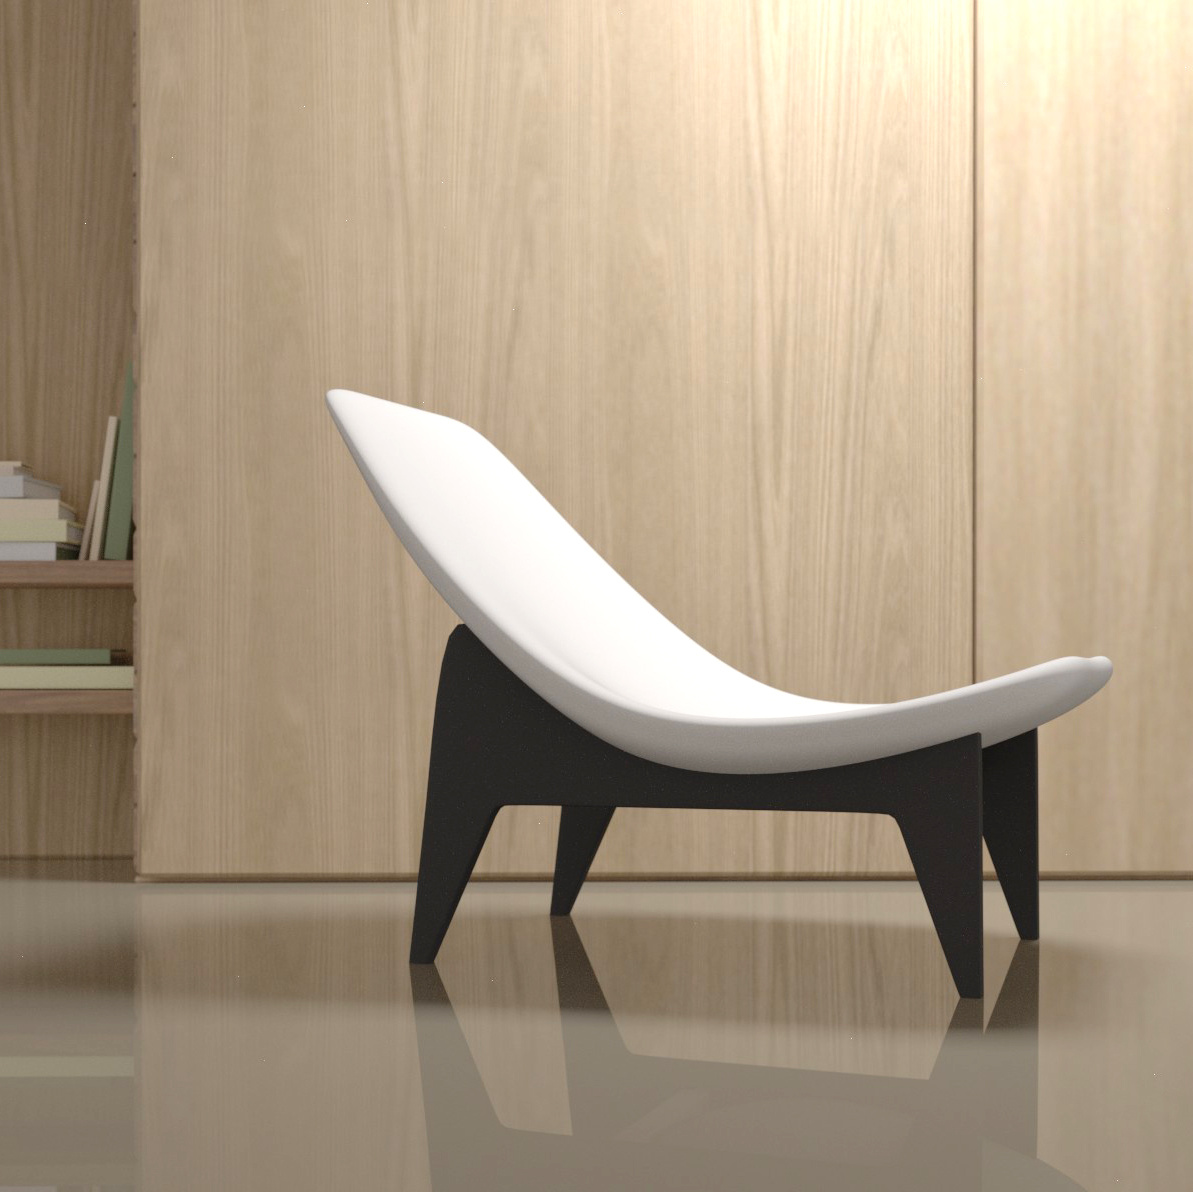 furniture design table. Modern British Furniture Design Studio, London Table K